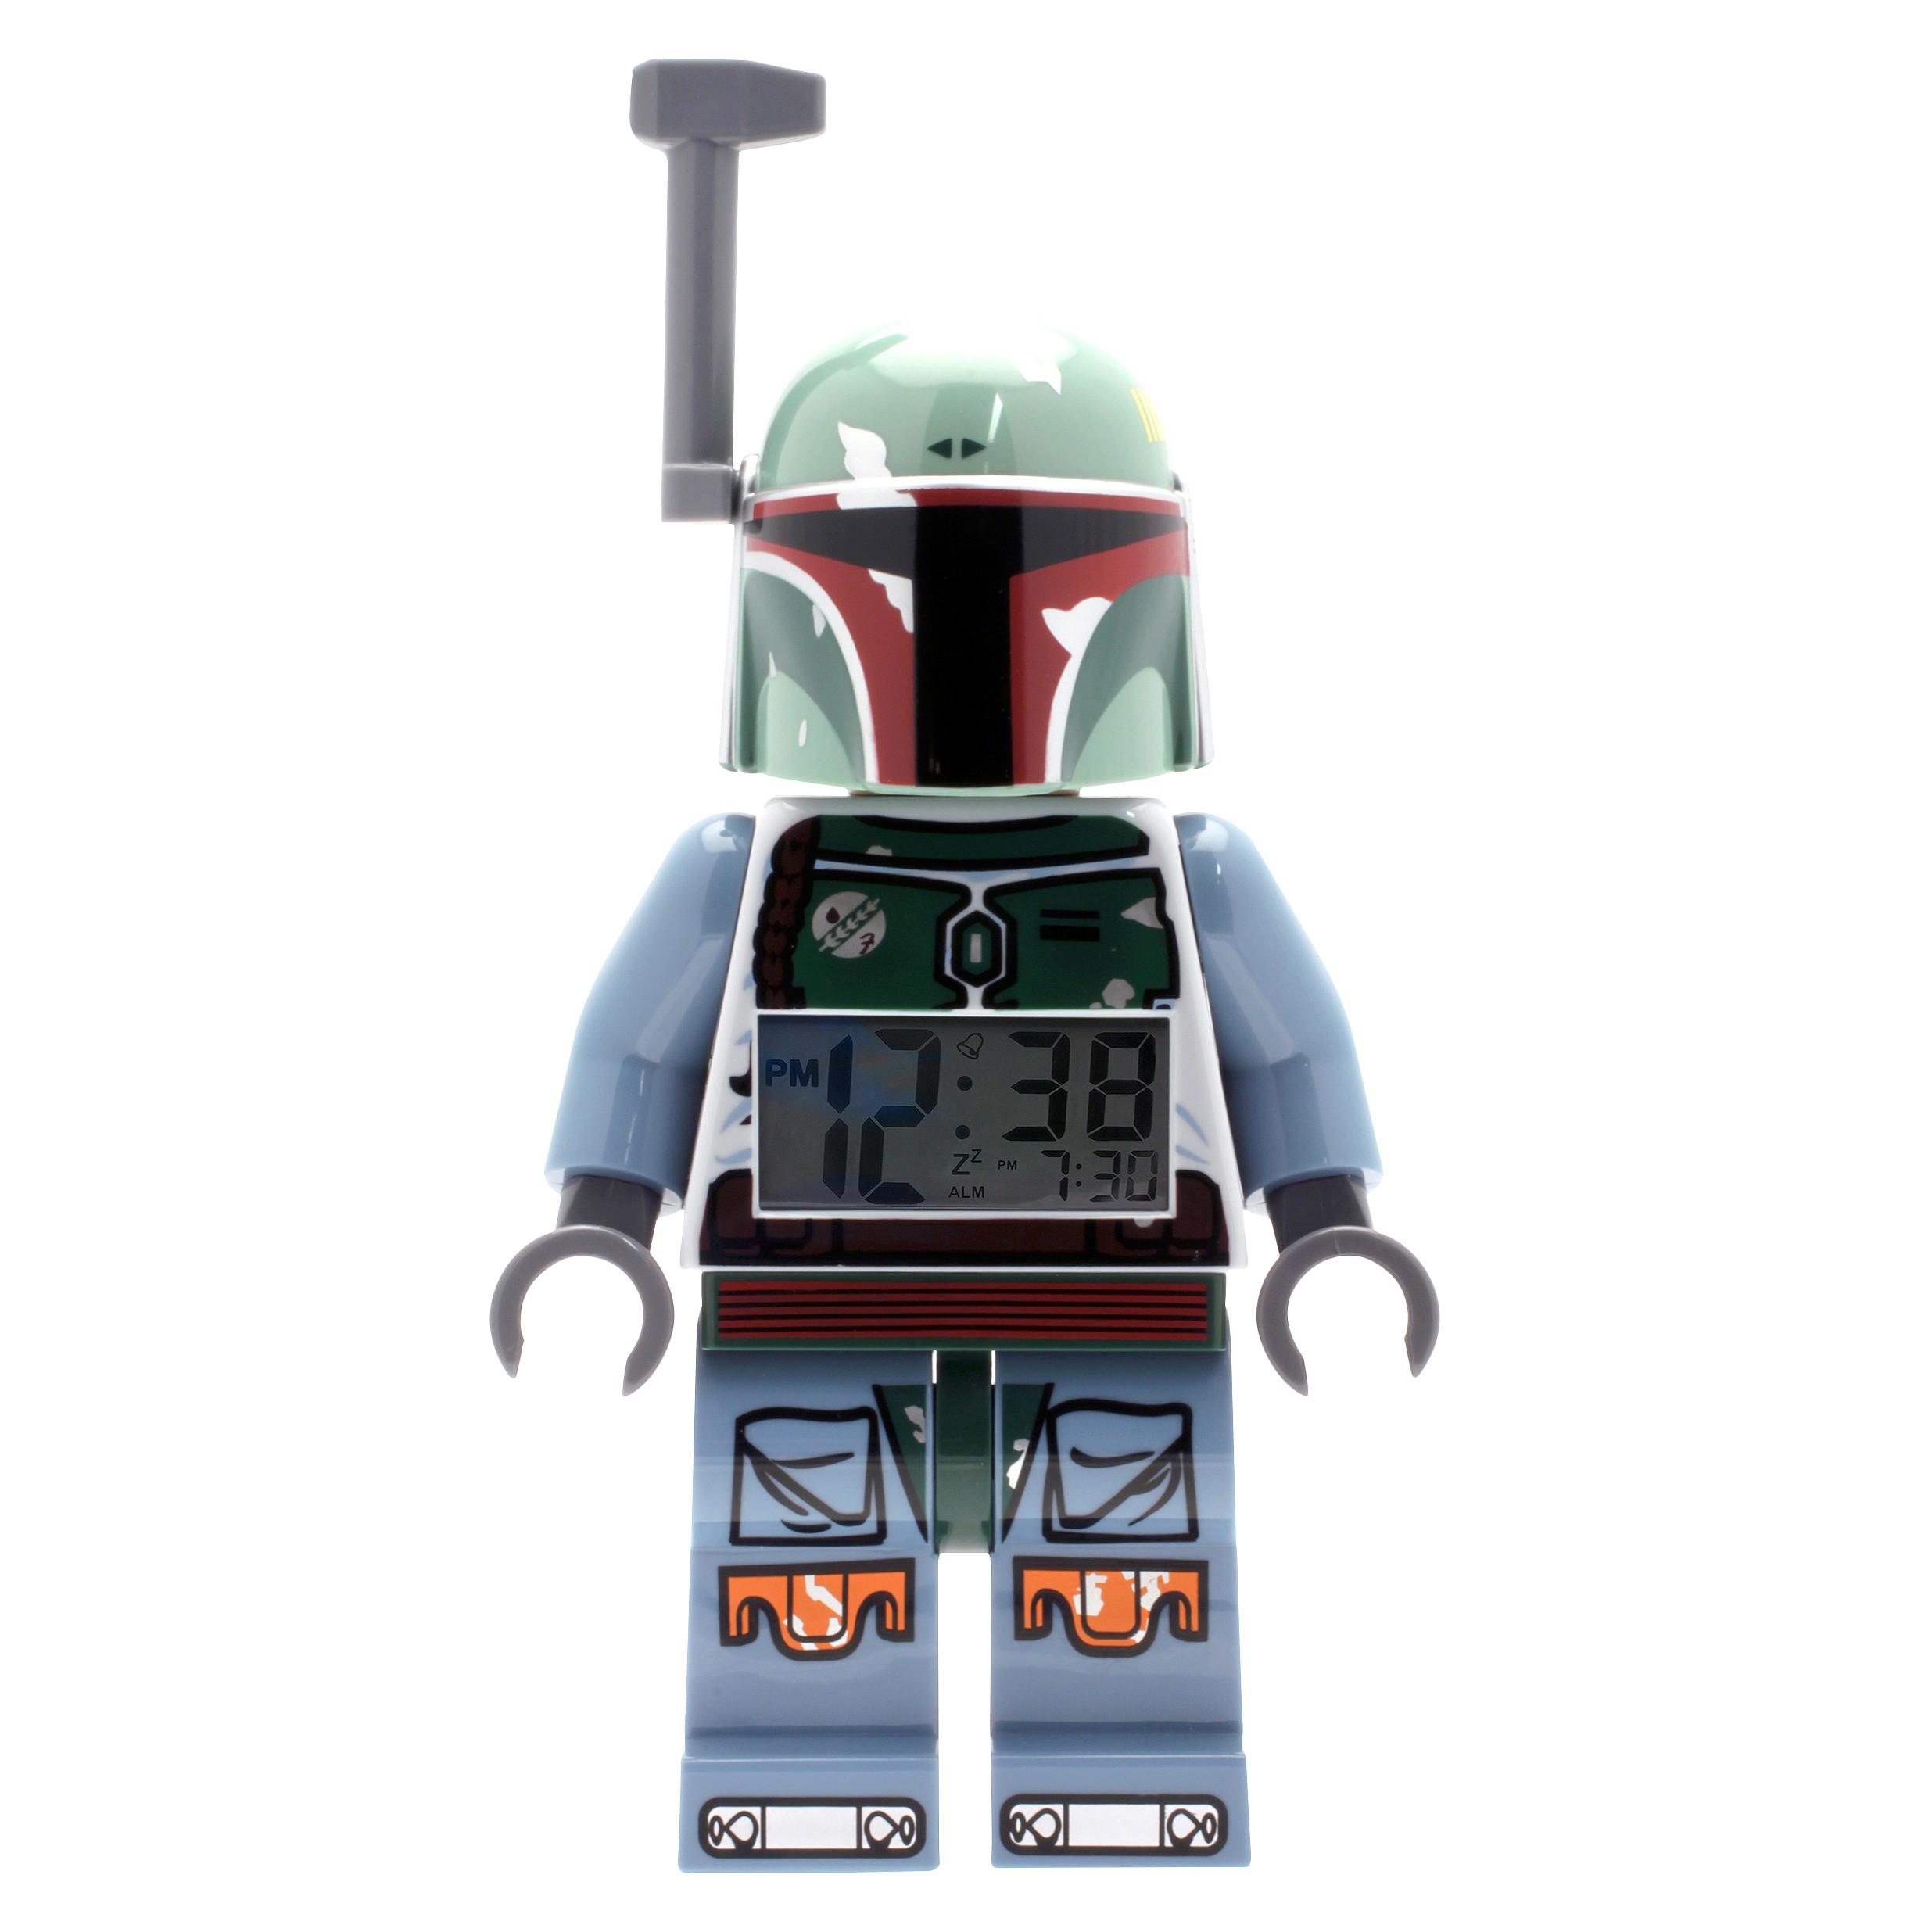 LEGO Boba Fett Minifigure Clock (5000249) (2012)